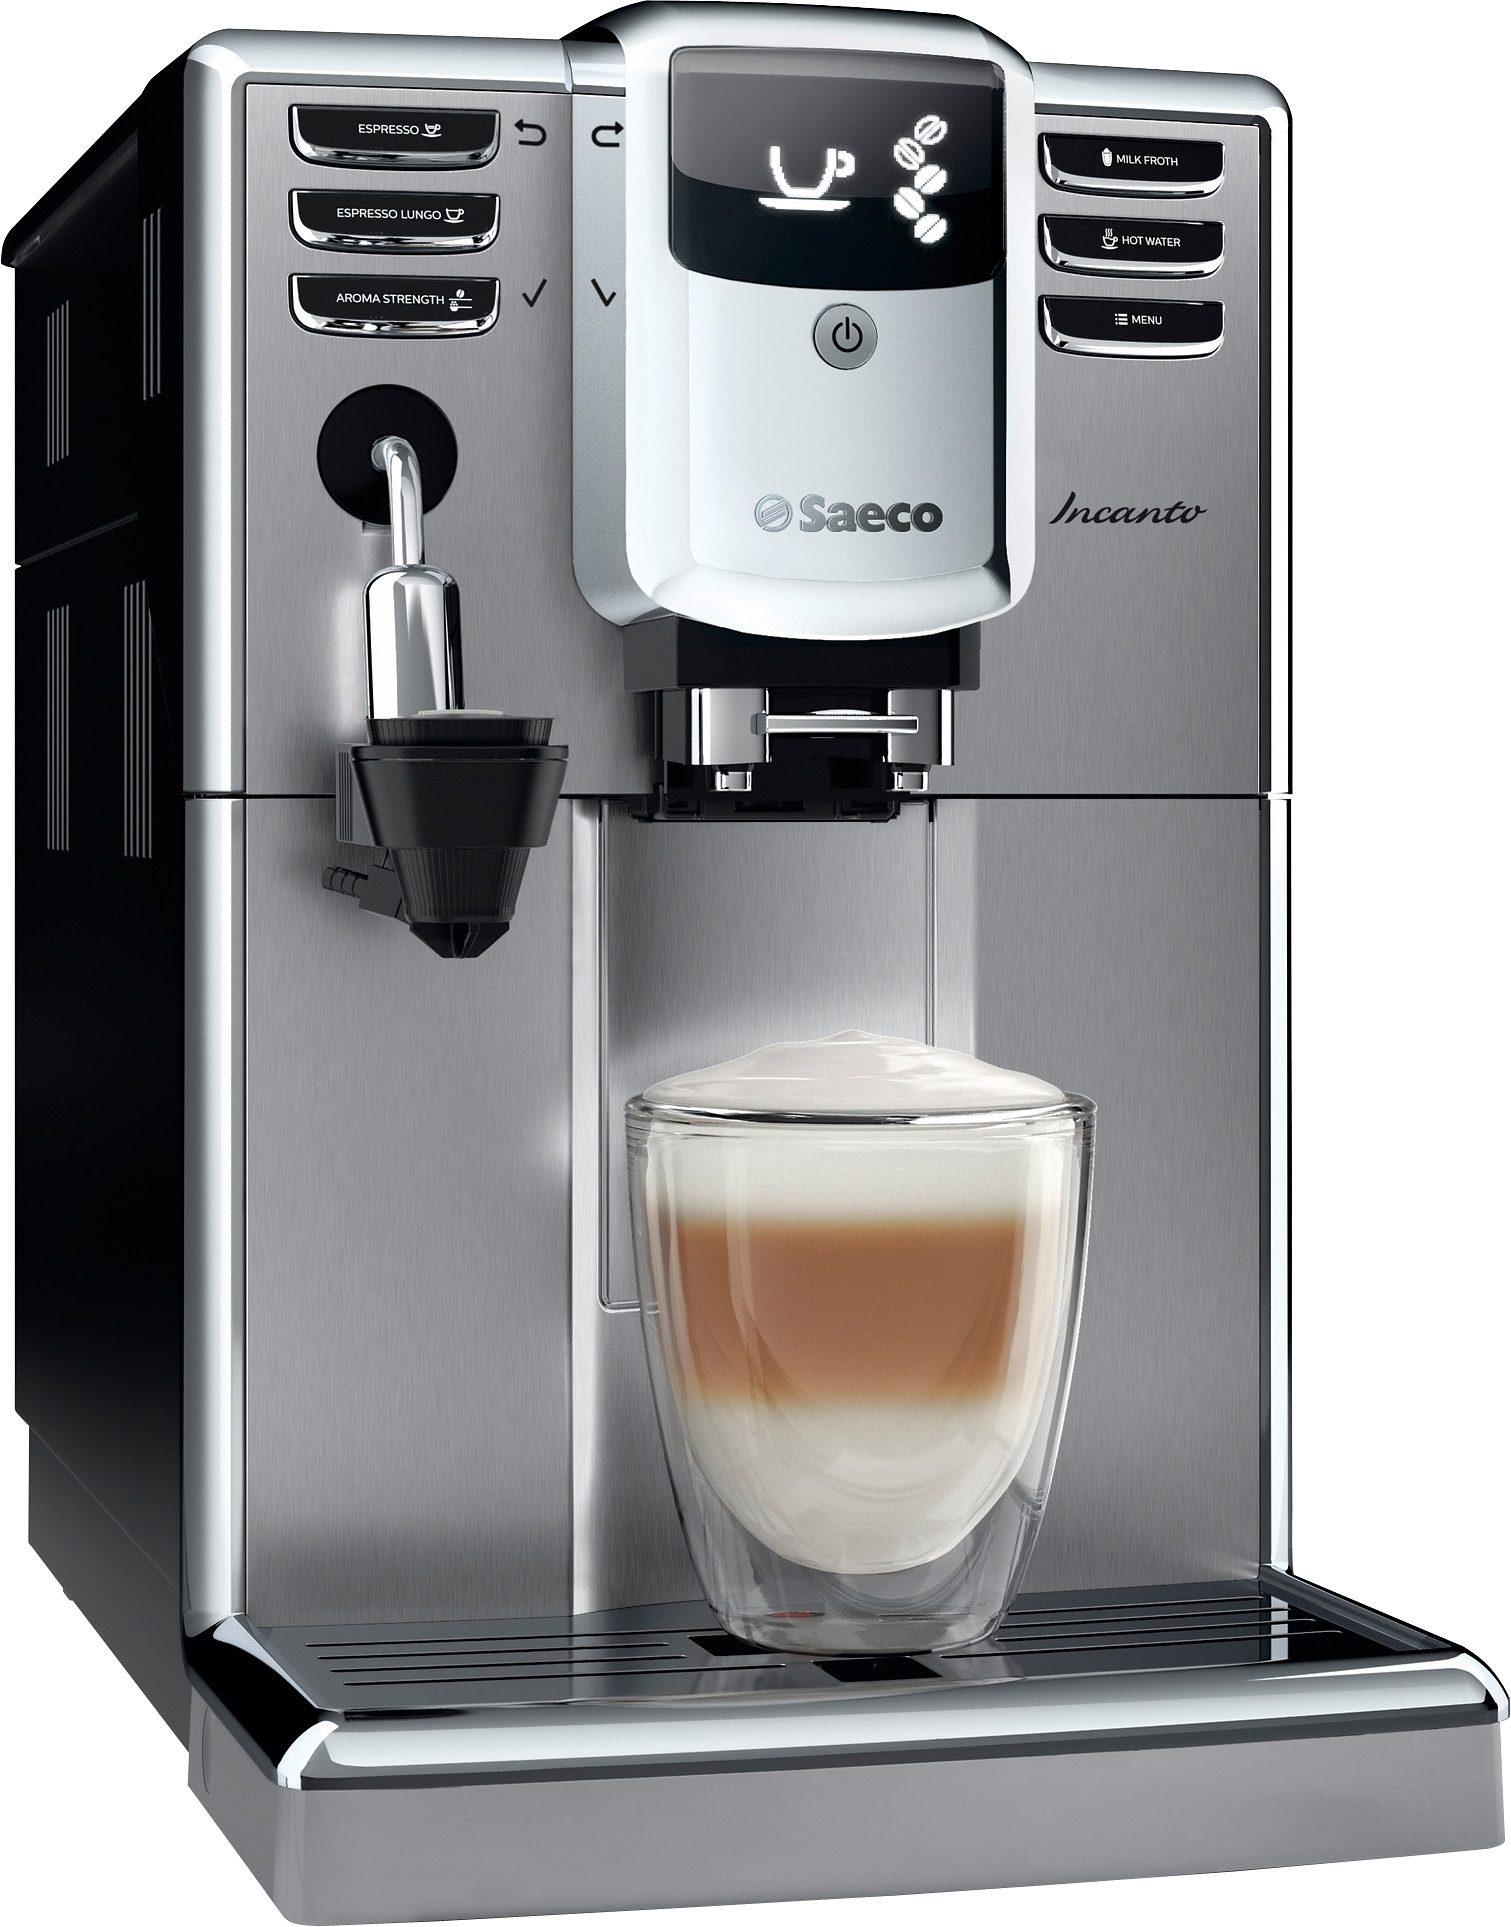 Saeco Kaffeevollautomat HD8914/01 Incanto mit Cappuccinatore, Edelstahl